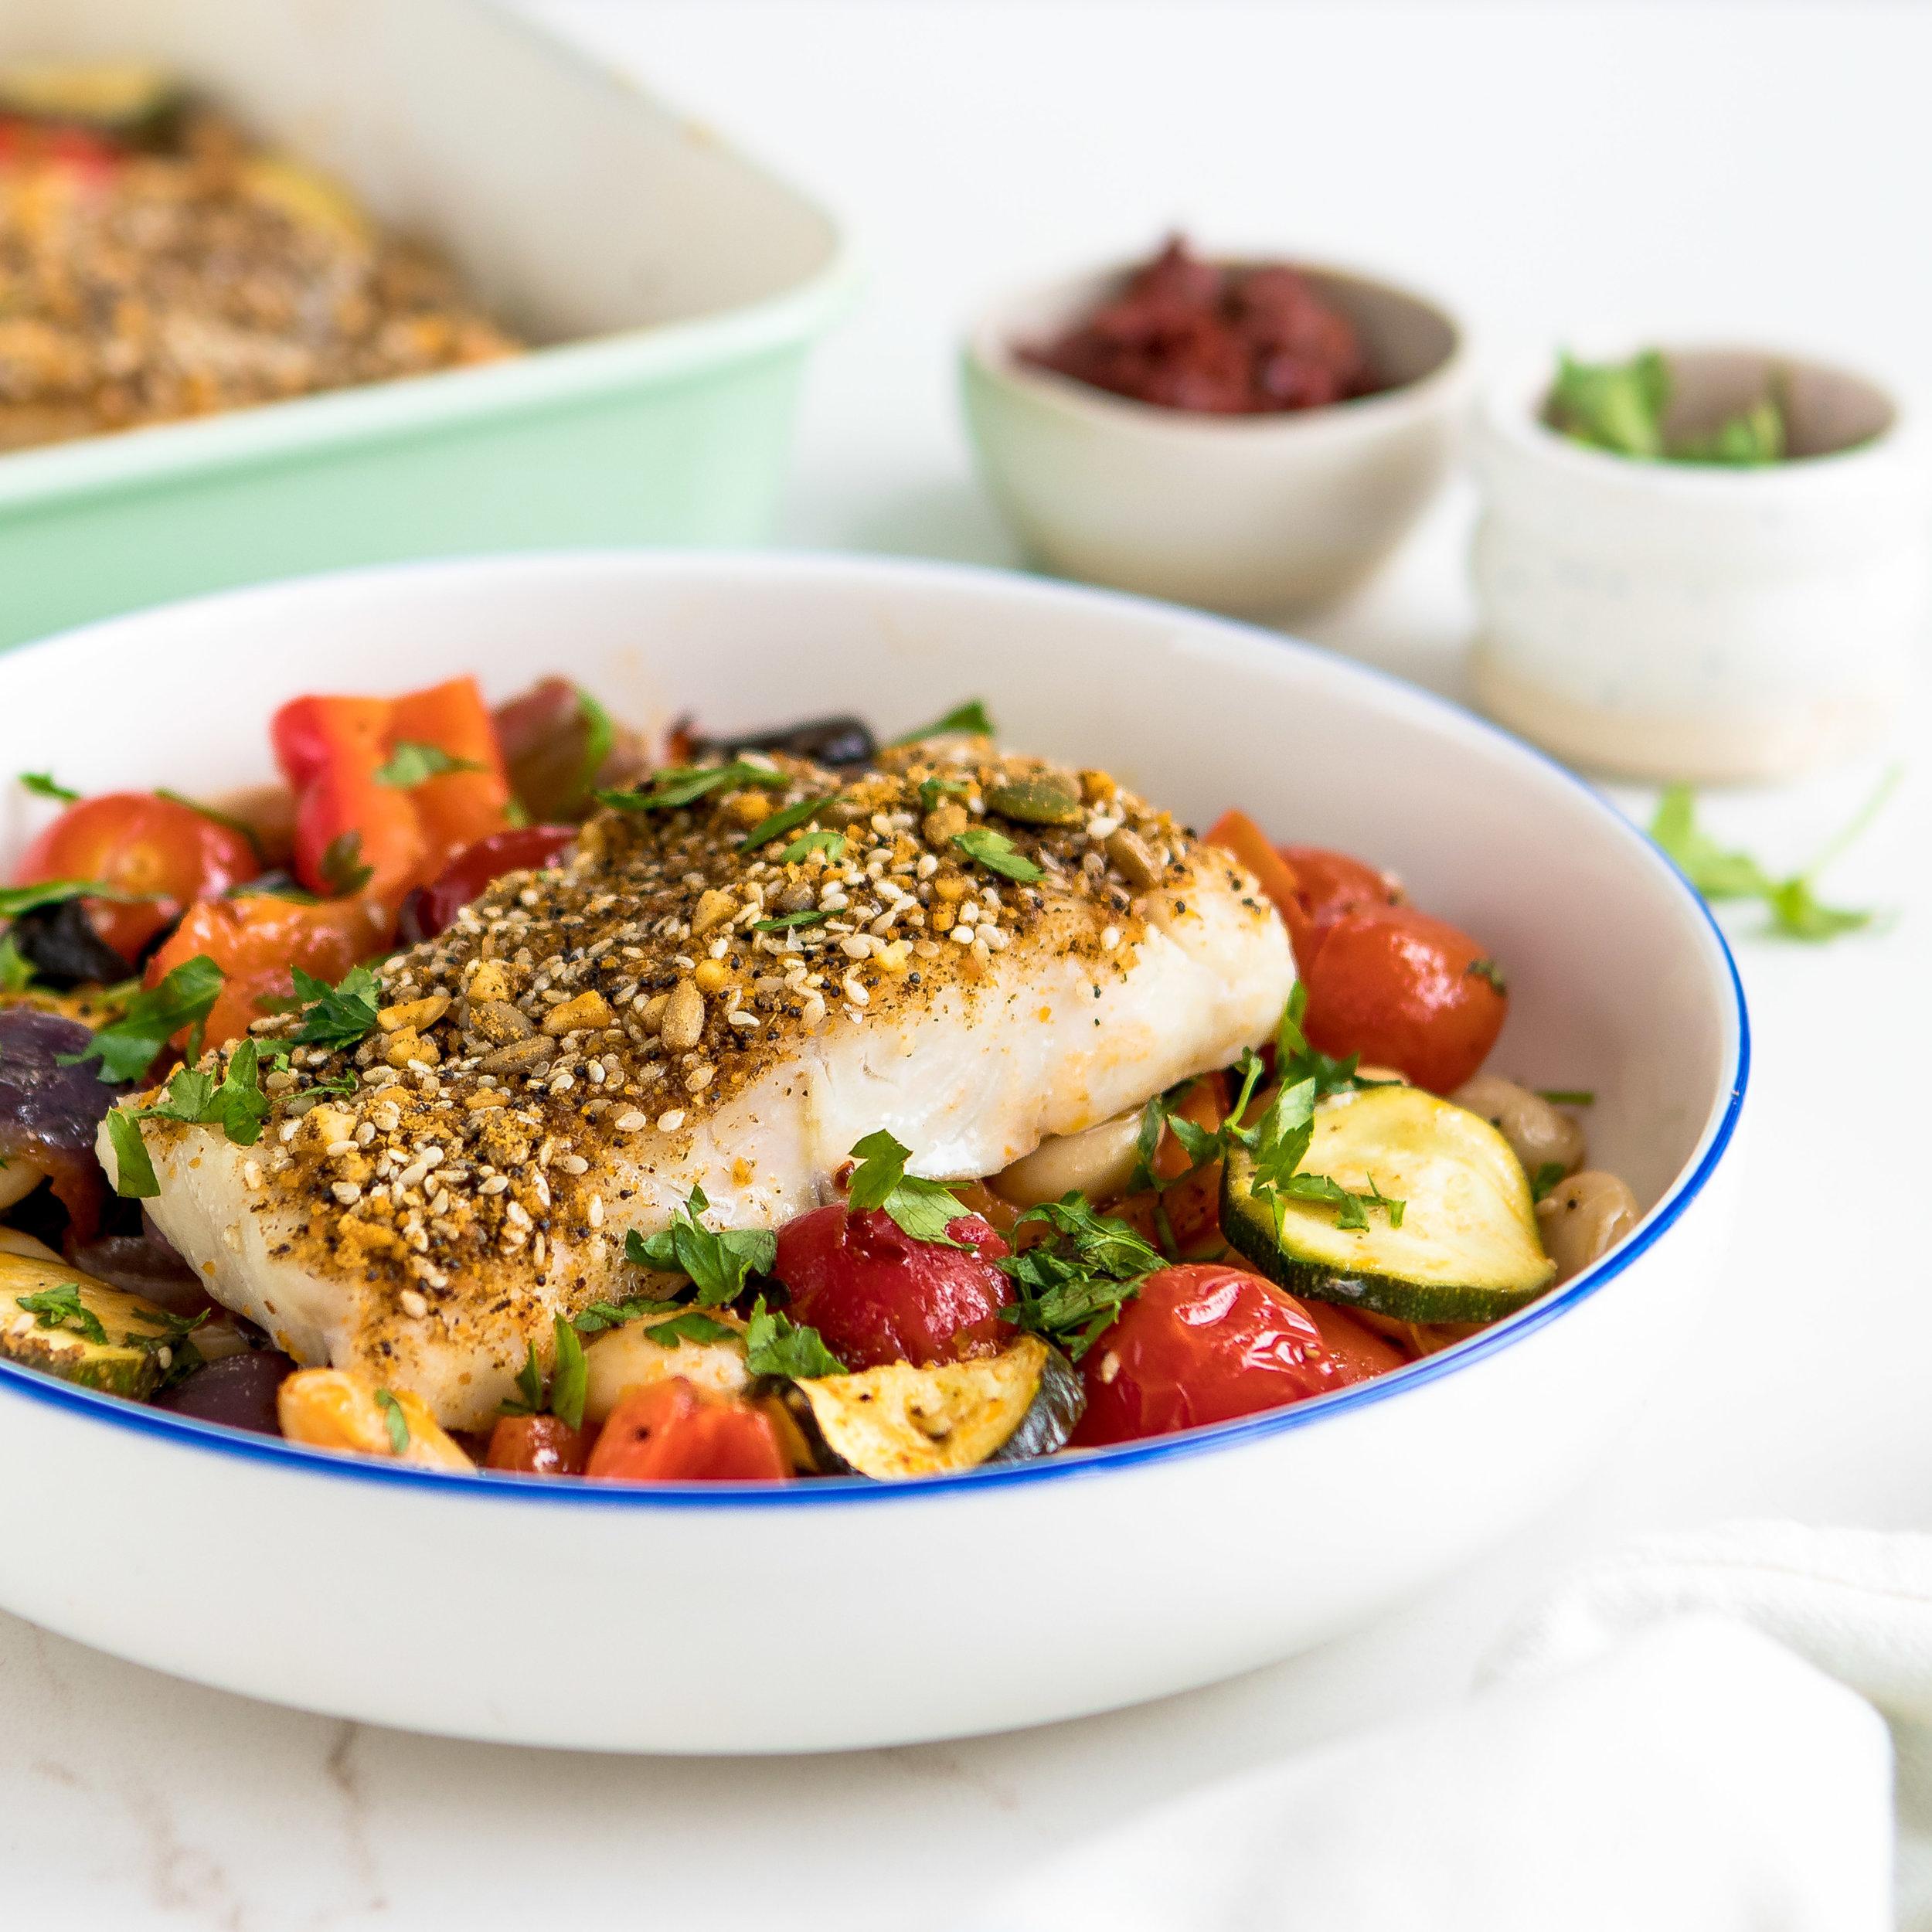 Dukkah cod & vegetable bake, rose harissa_3.jpg